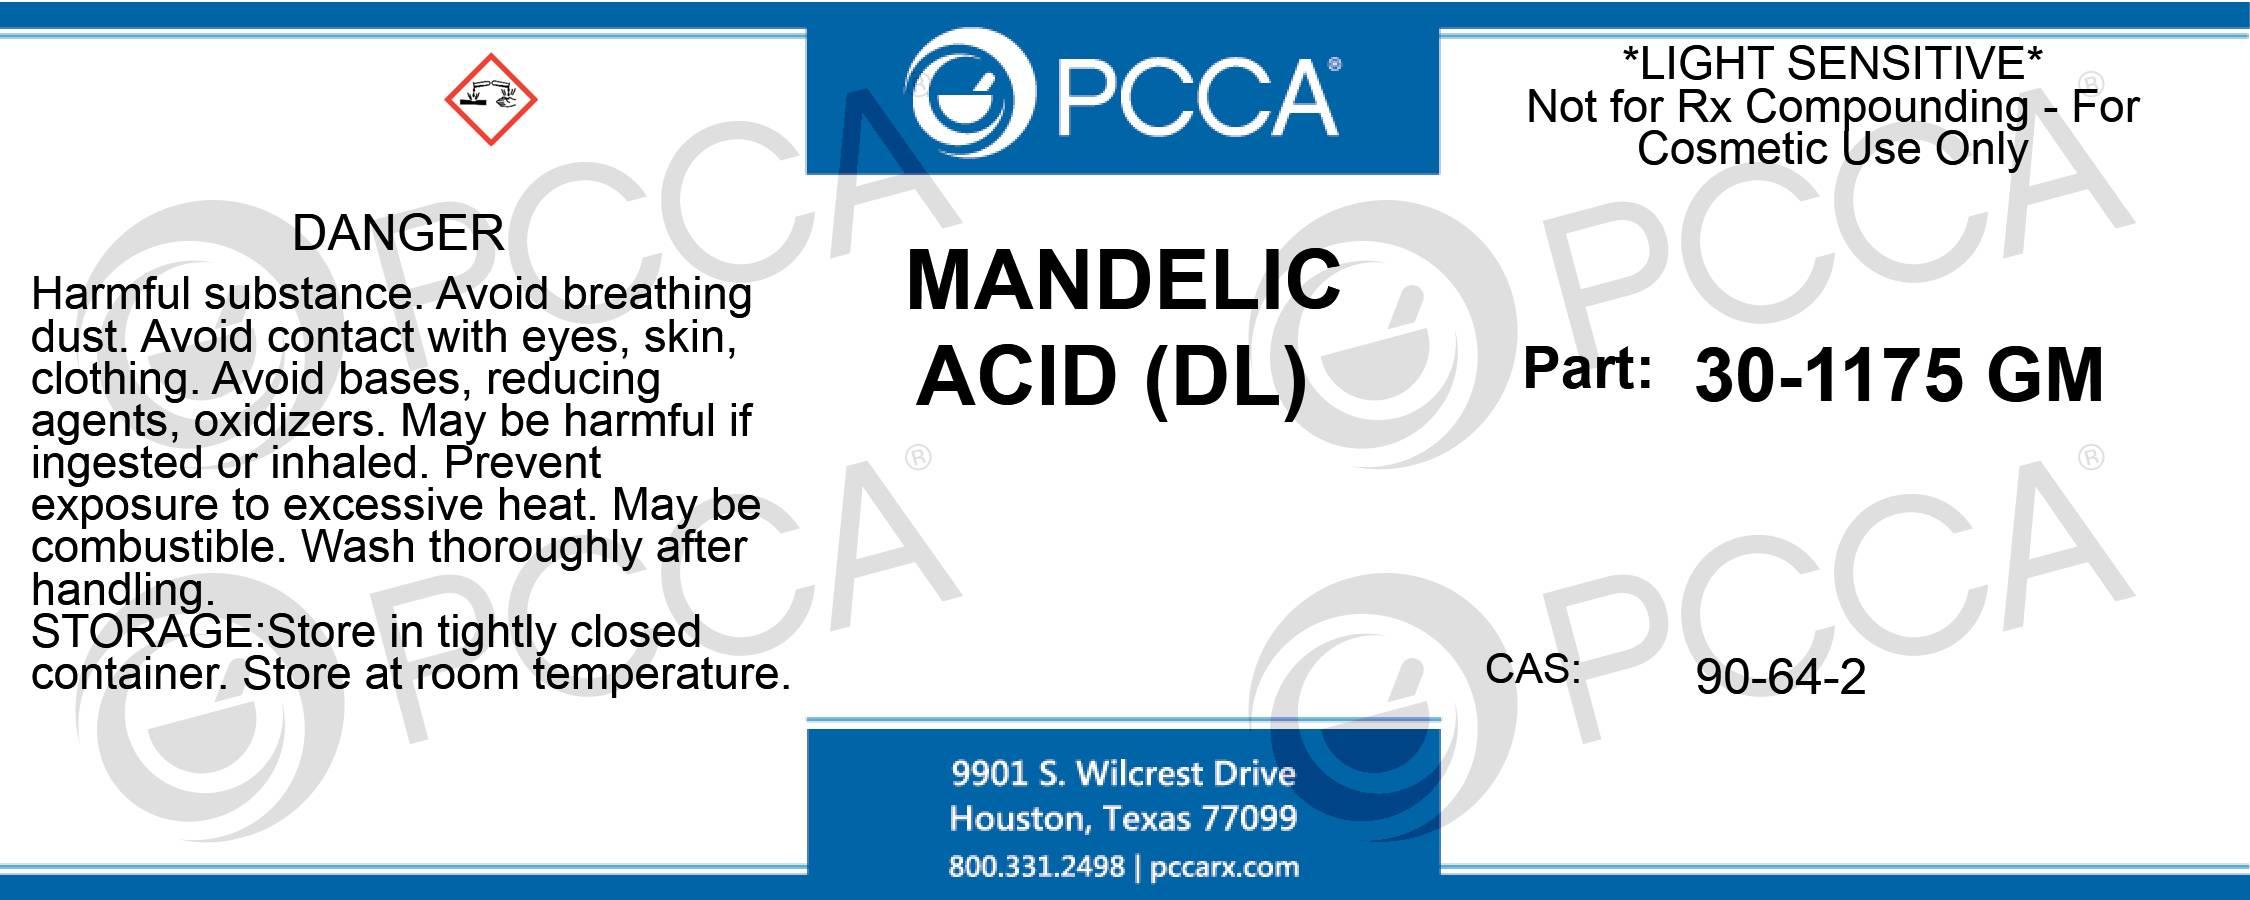 MANDELIC ACID (DL) - PCCA